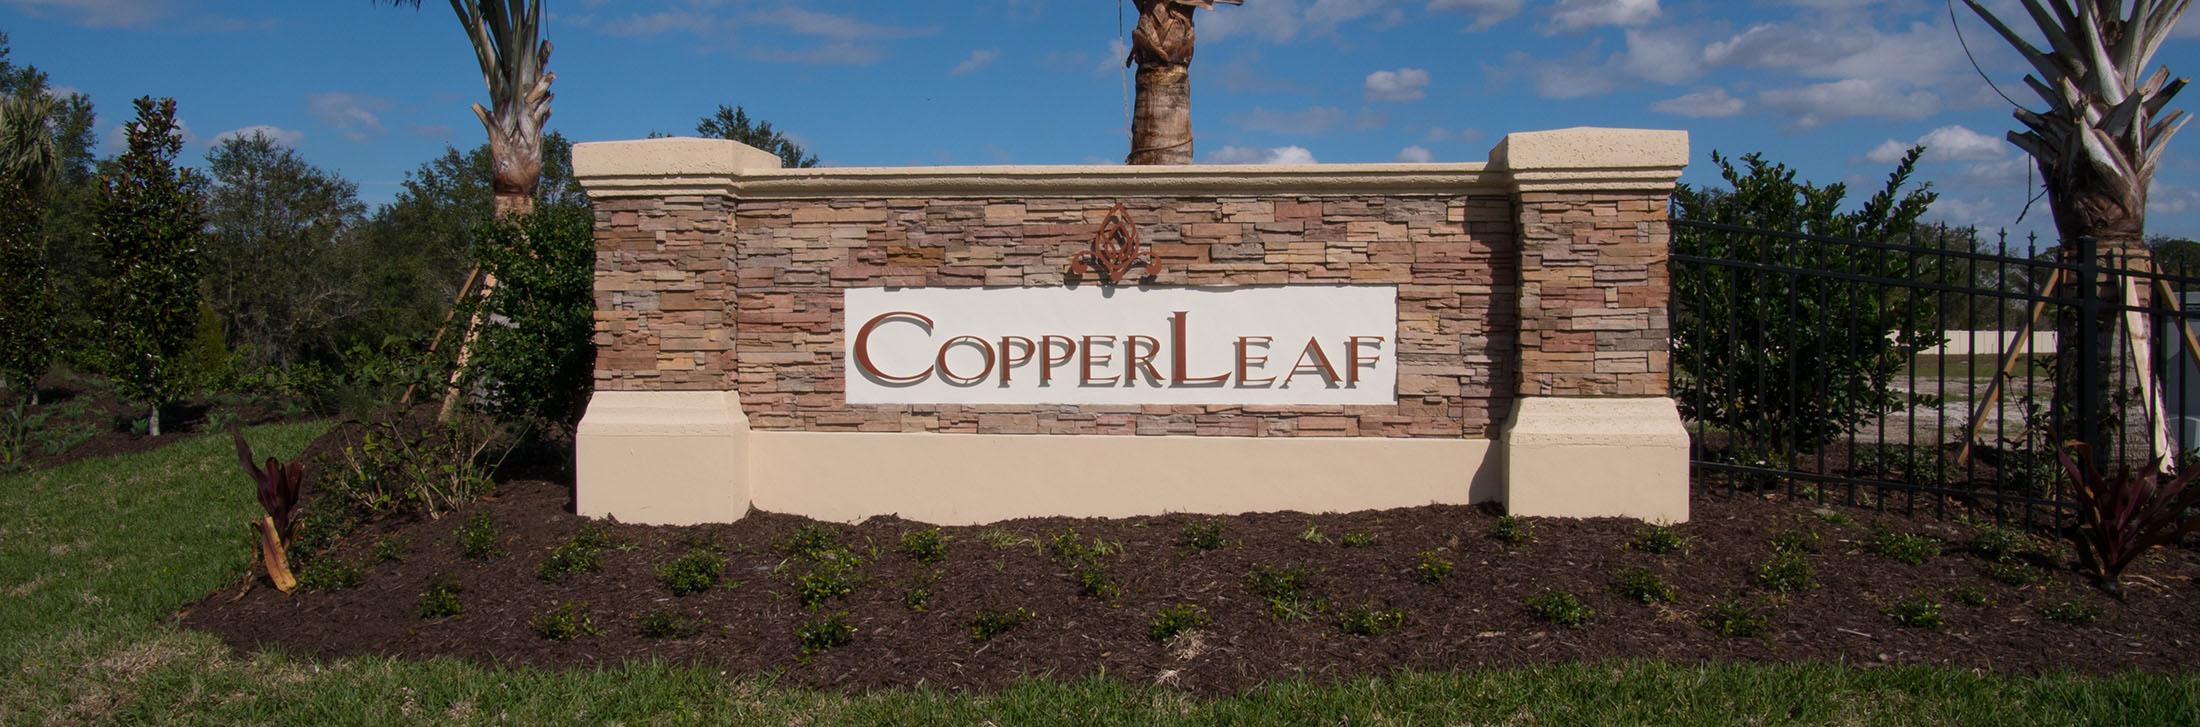 Copperleaf Homes For Sale Bradenton Fl